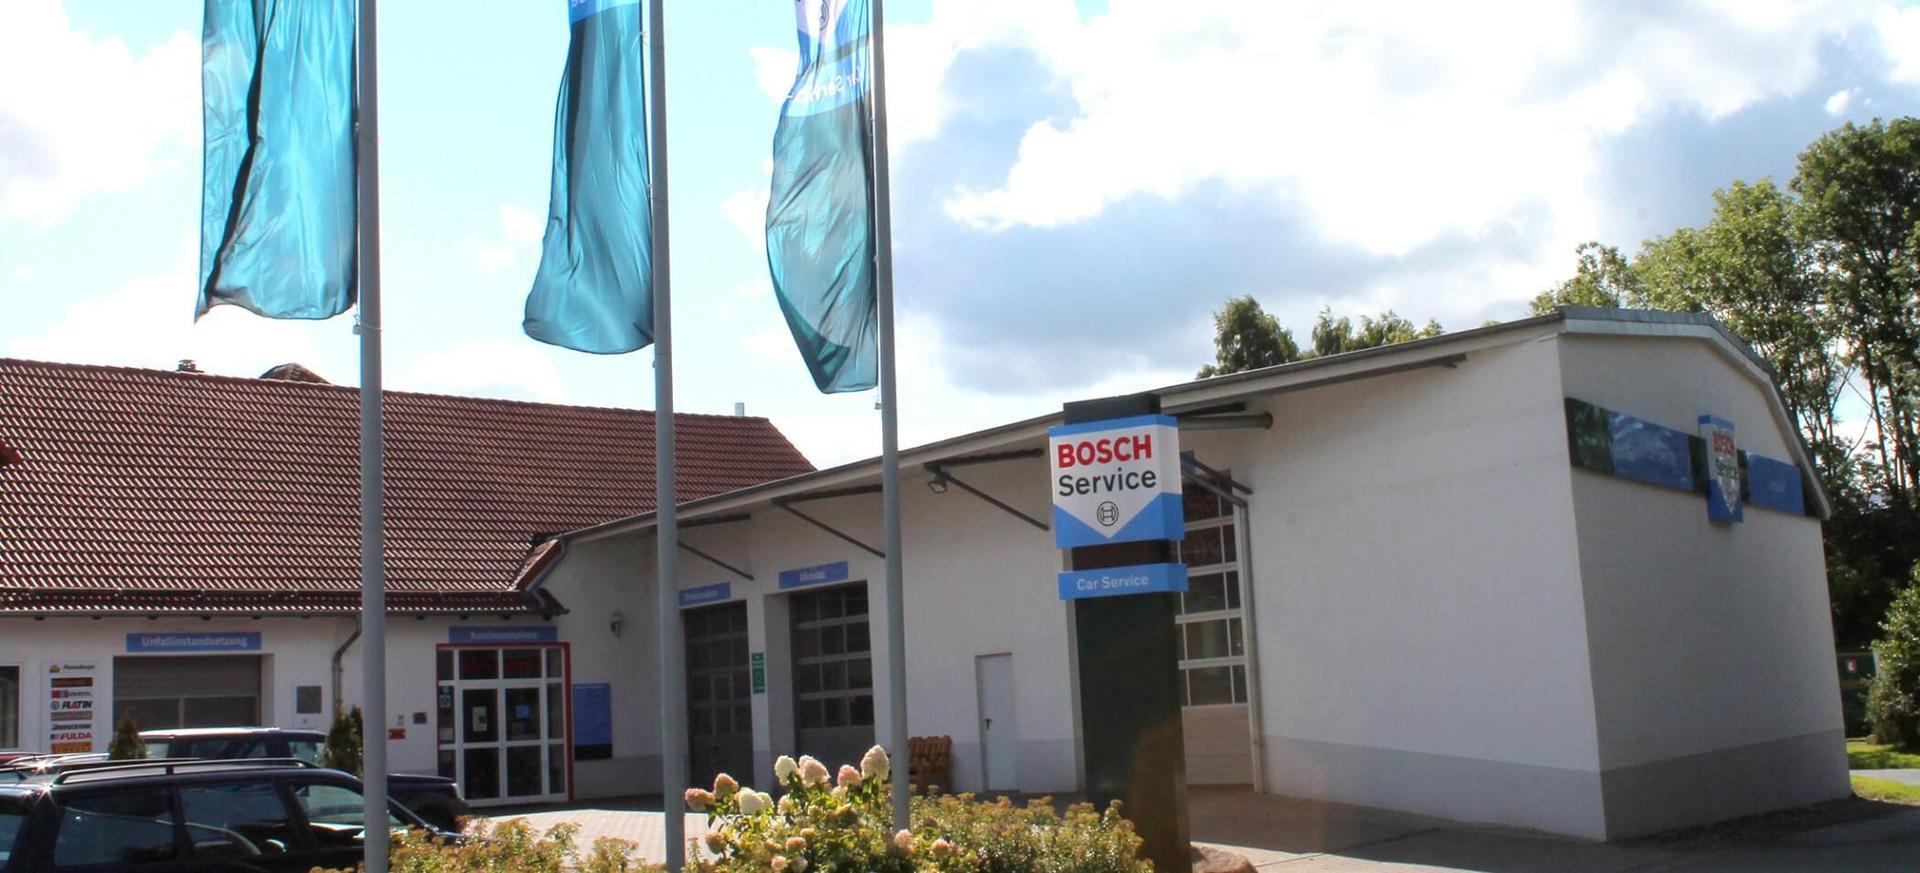 Autoservice Liensdorf Bosch Car Service in Lamspringe